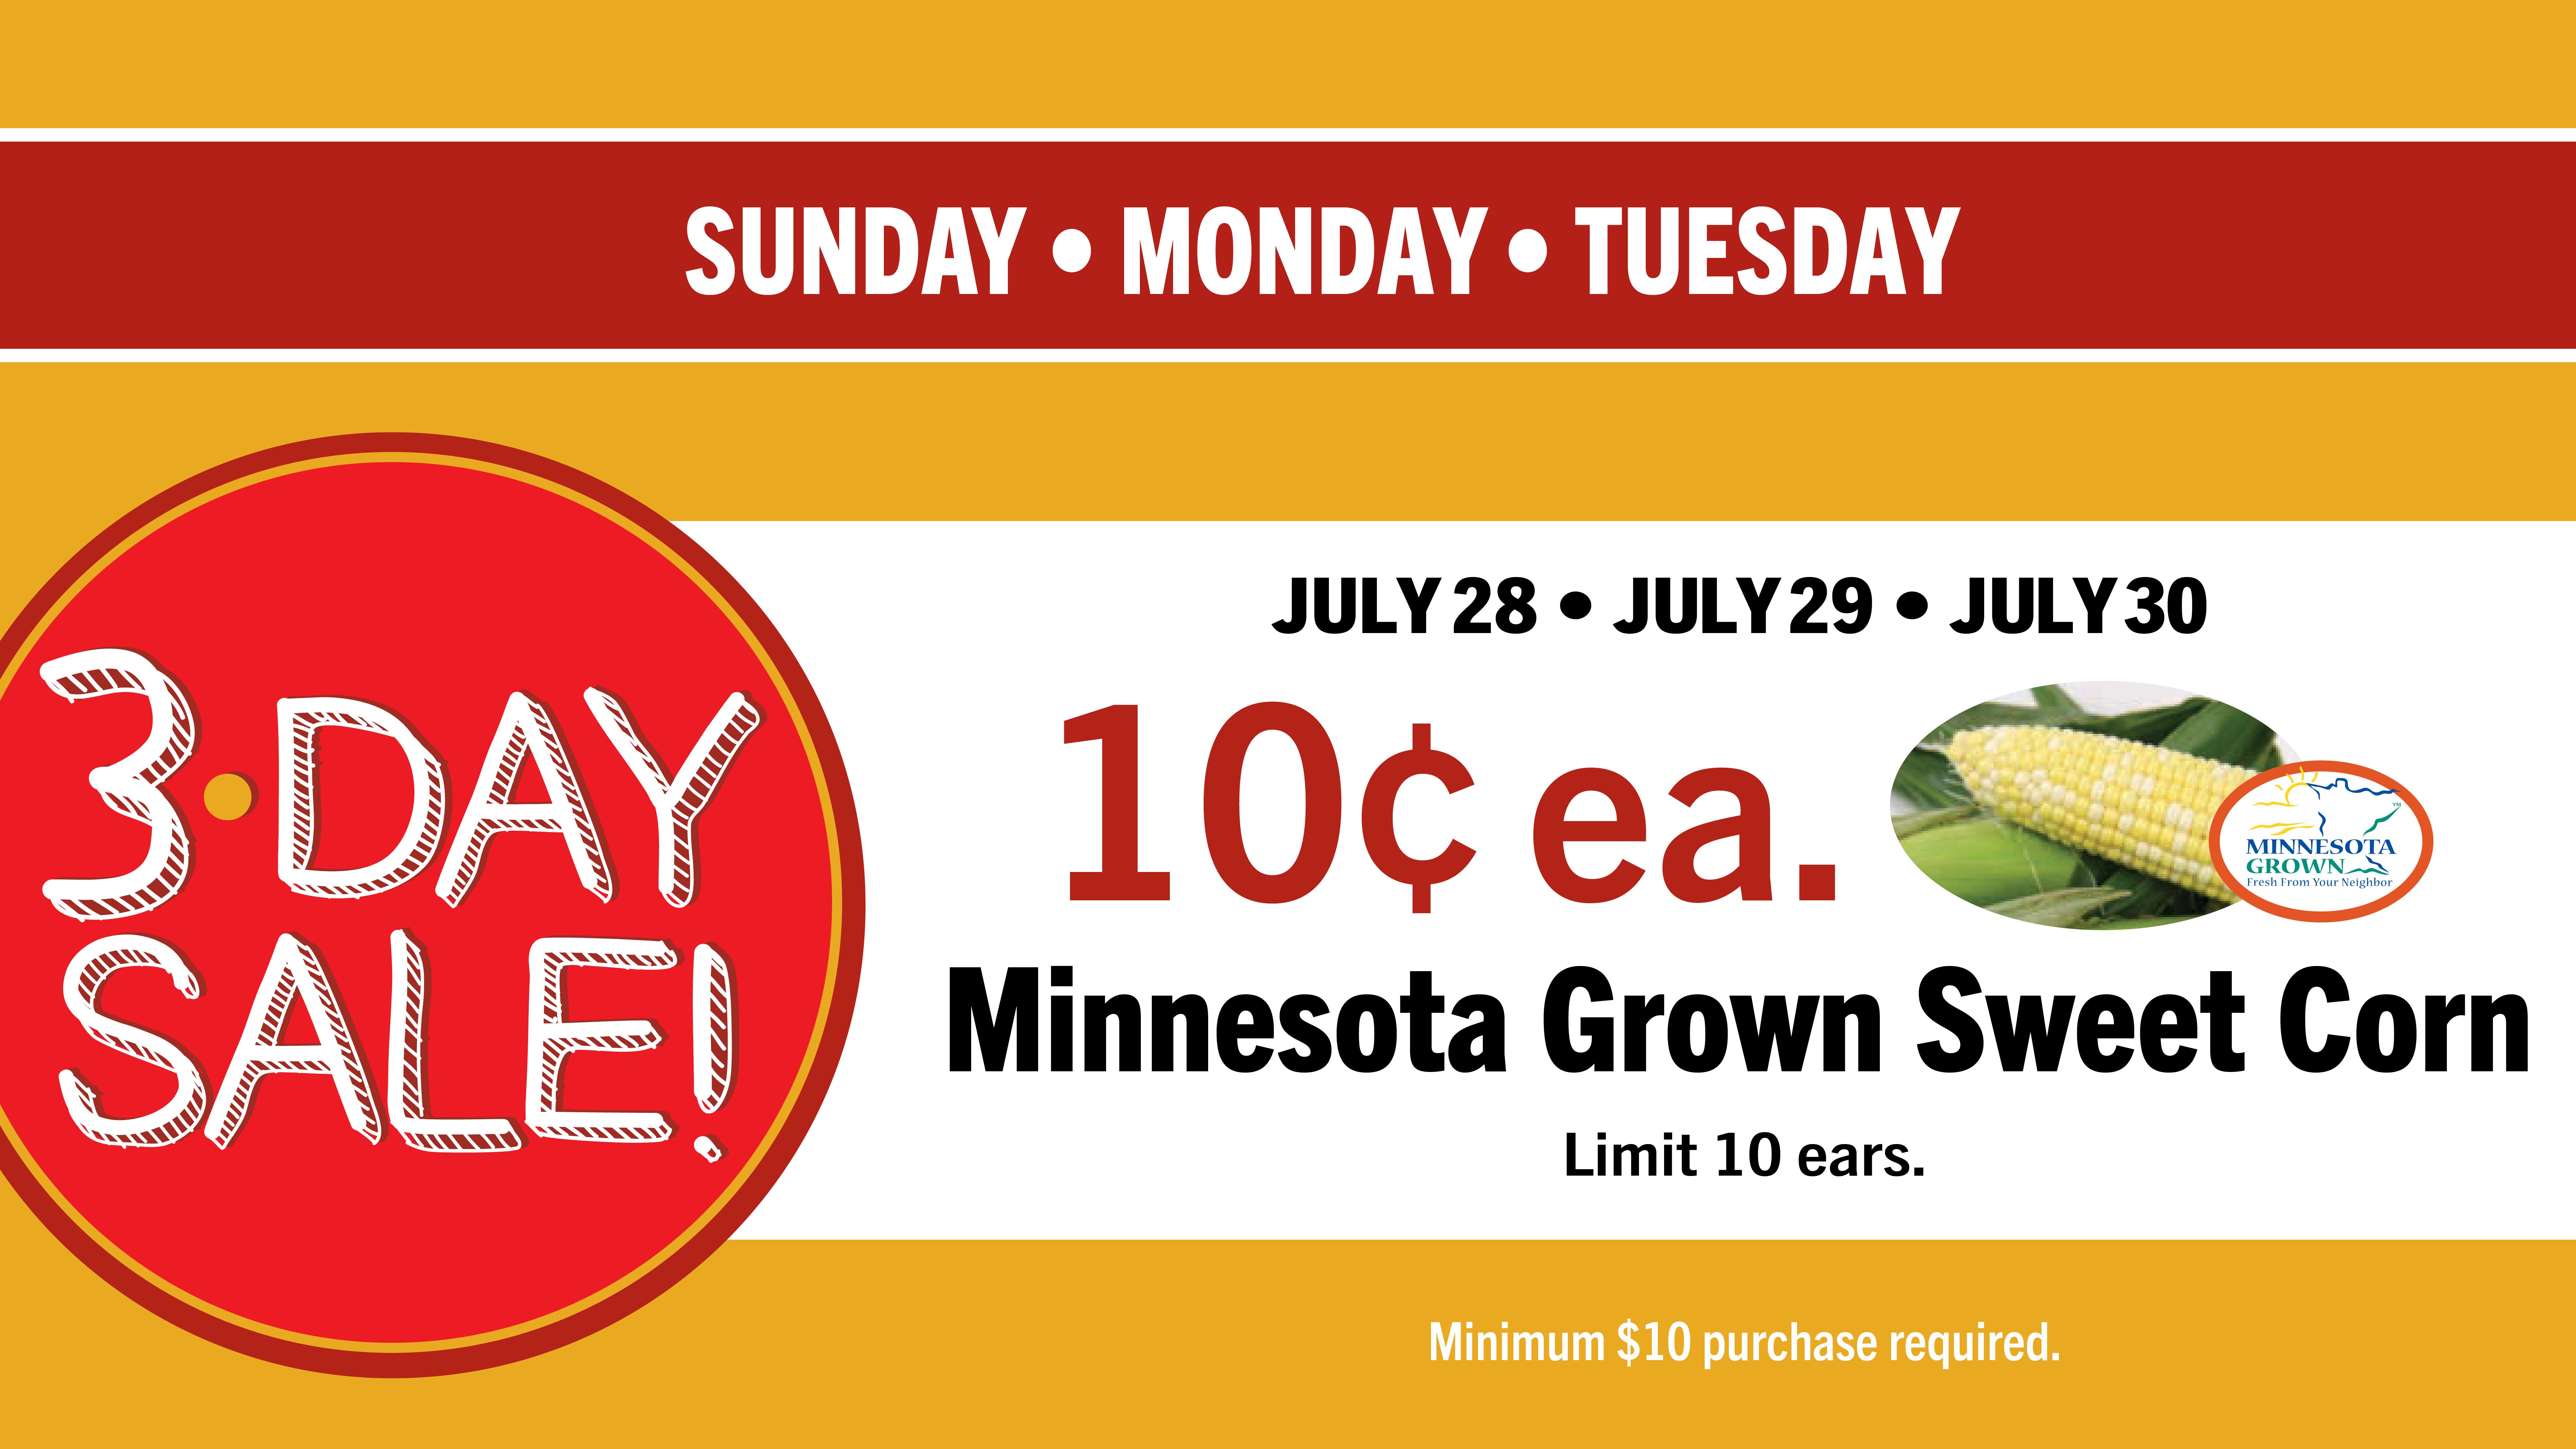 Sunday, July 28 – Tuesday, July 30